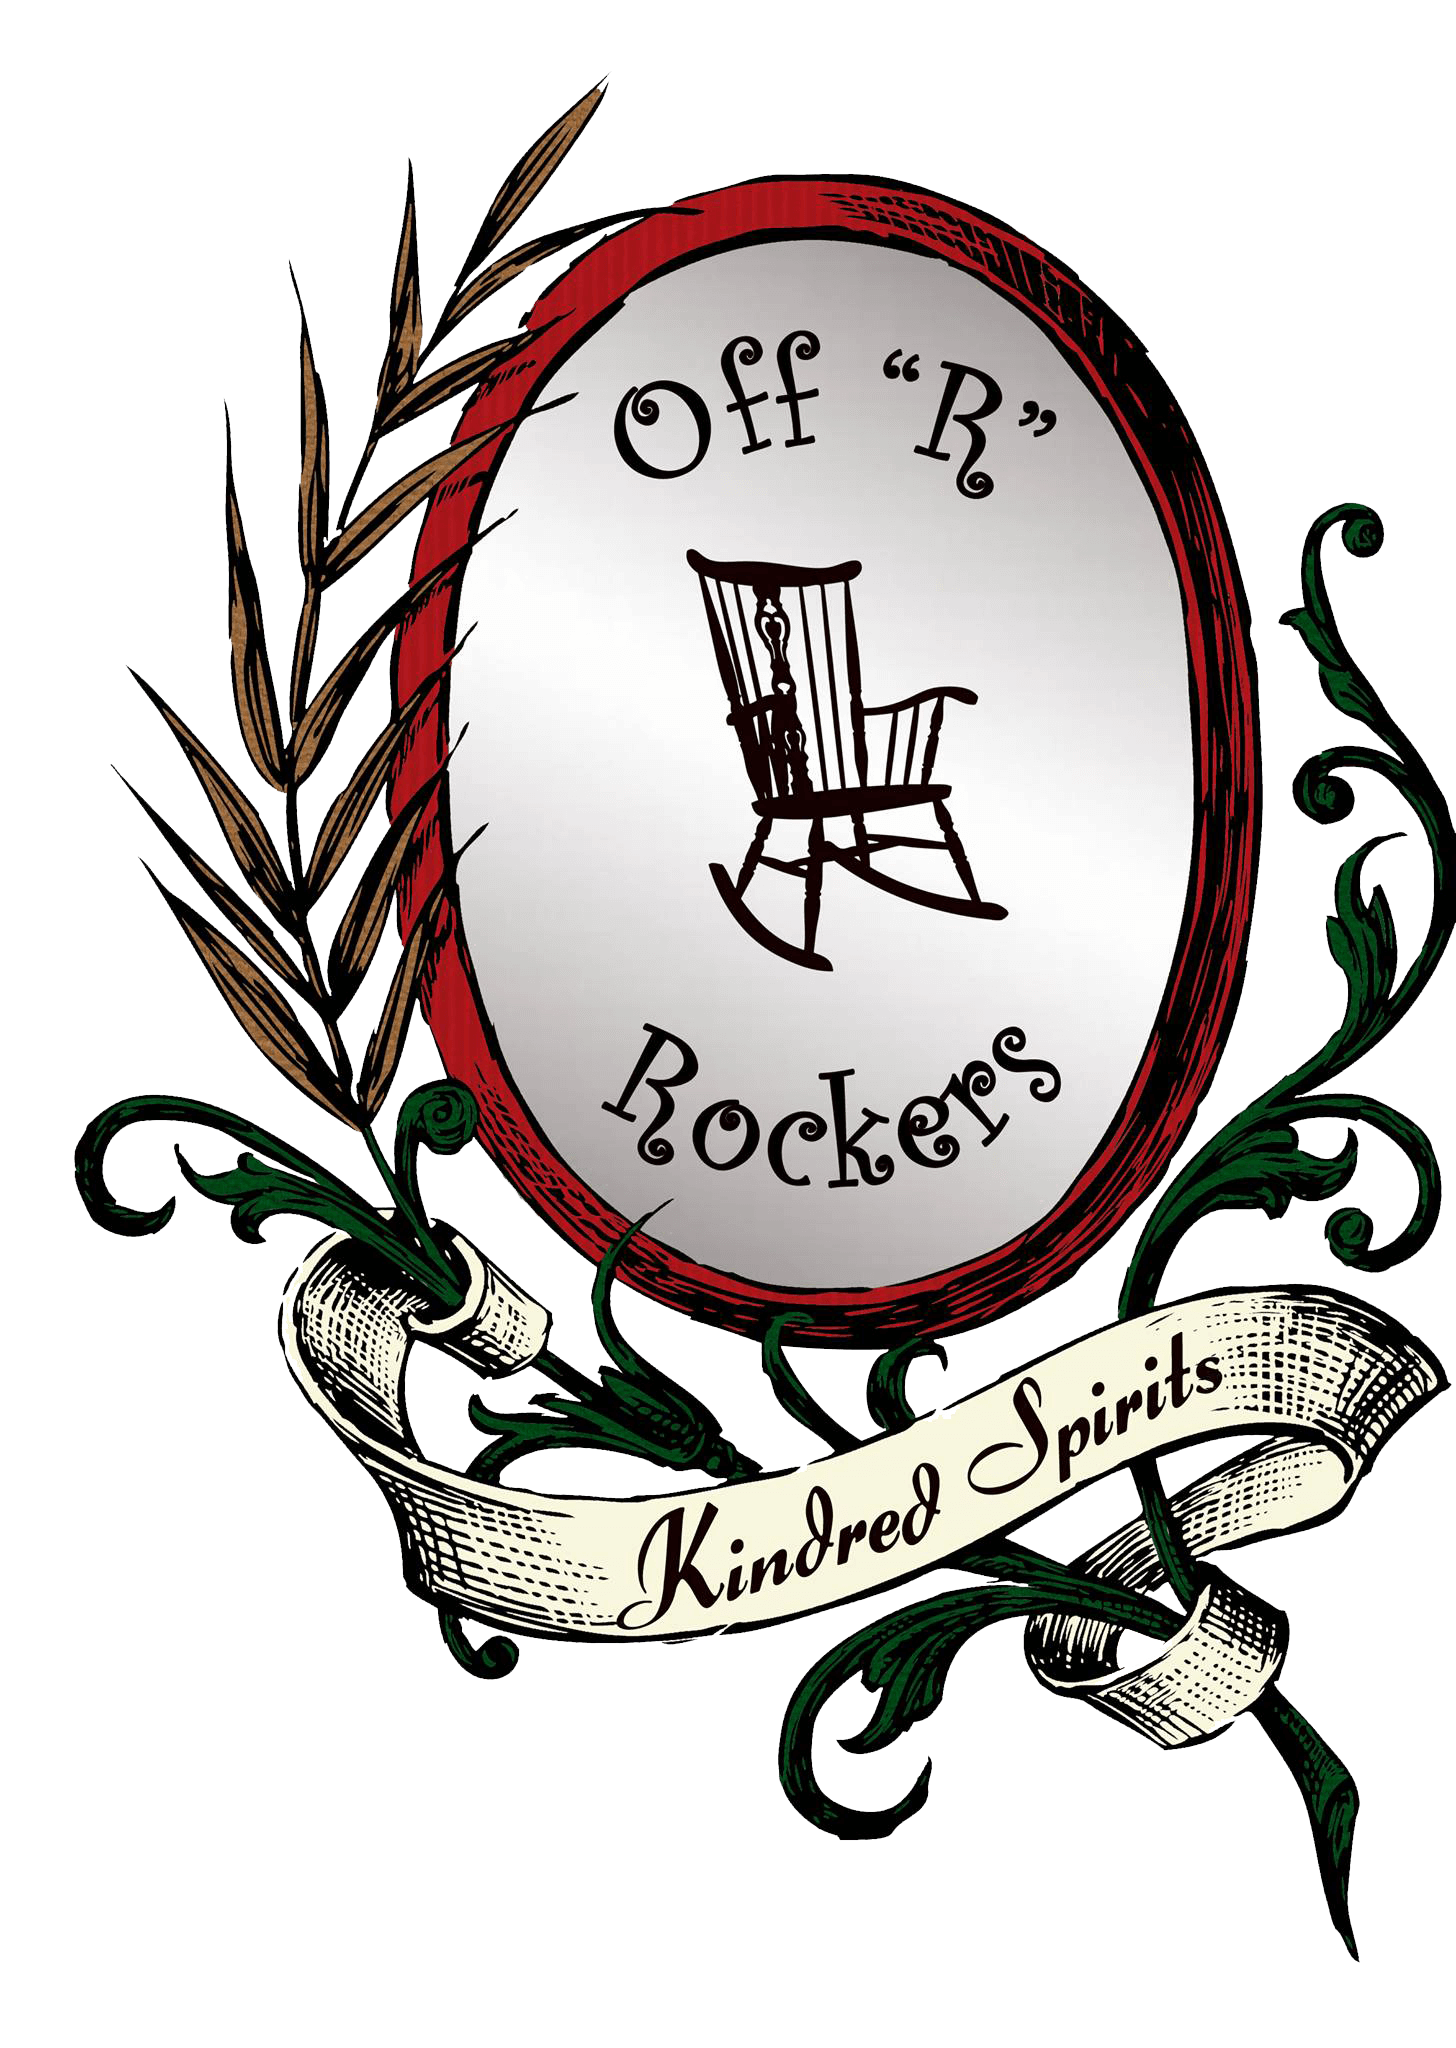 Off R Rockers logo 2.png